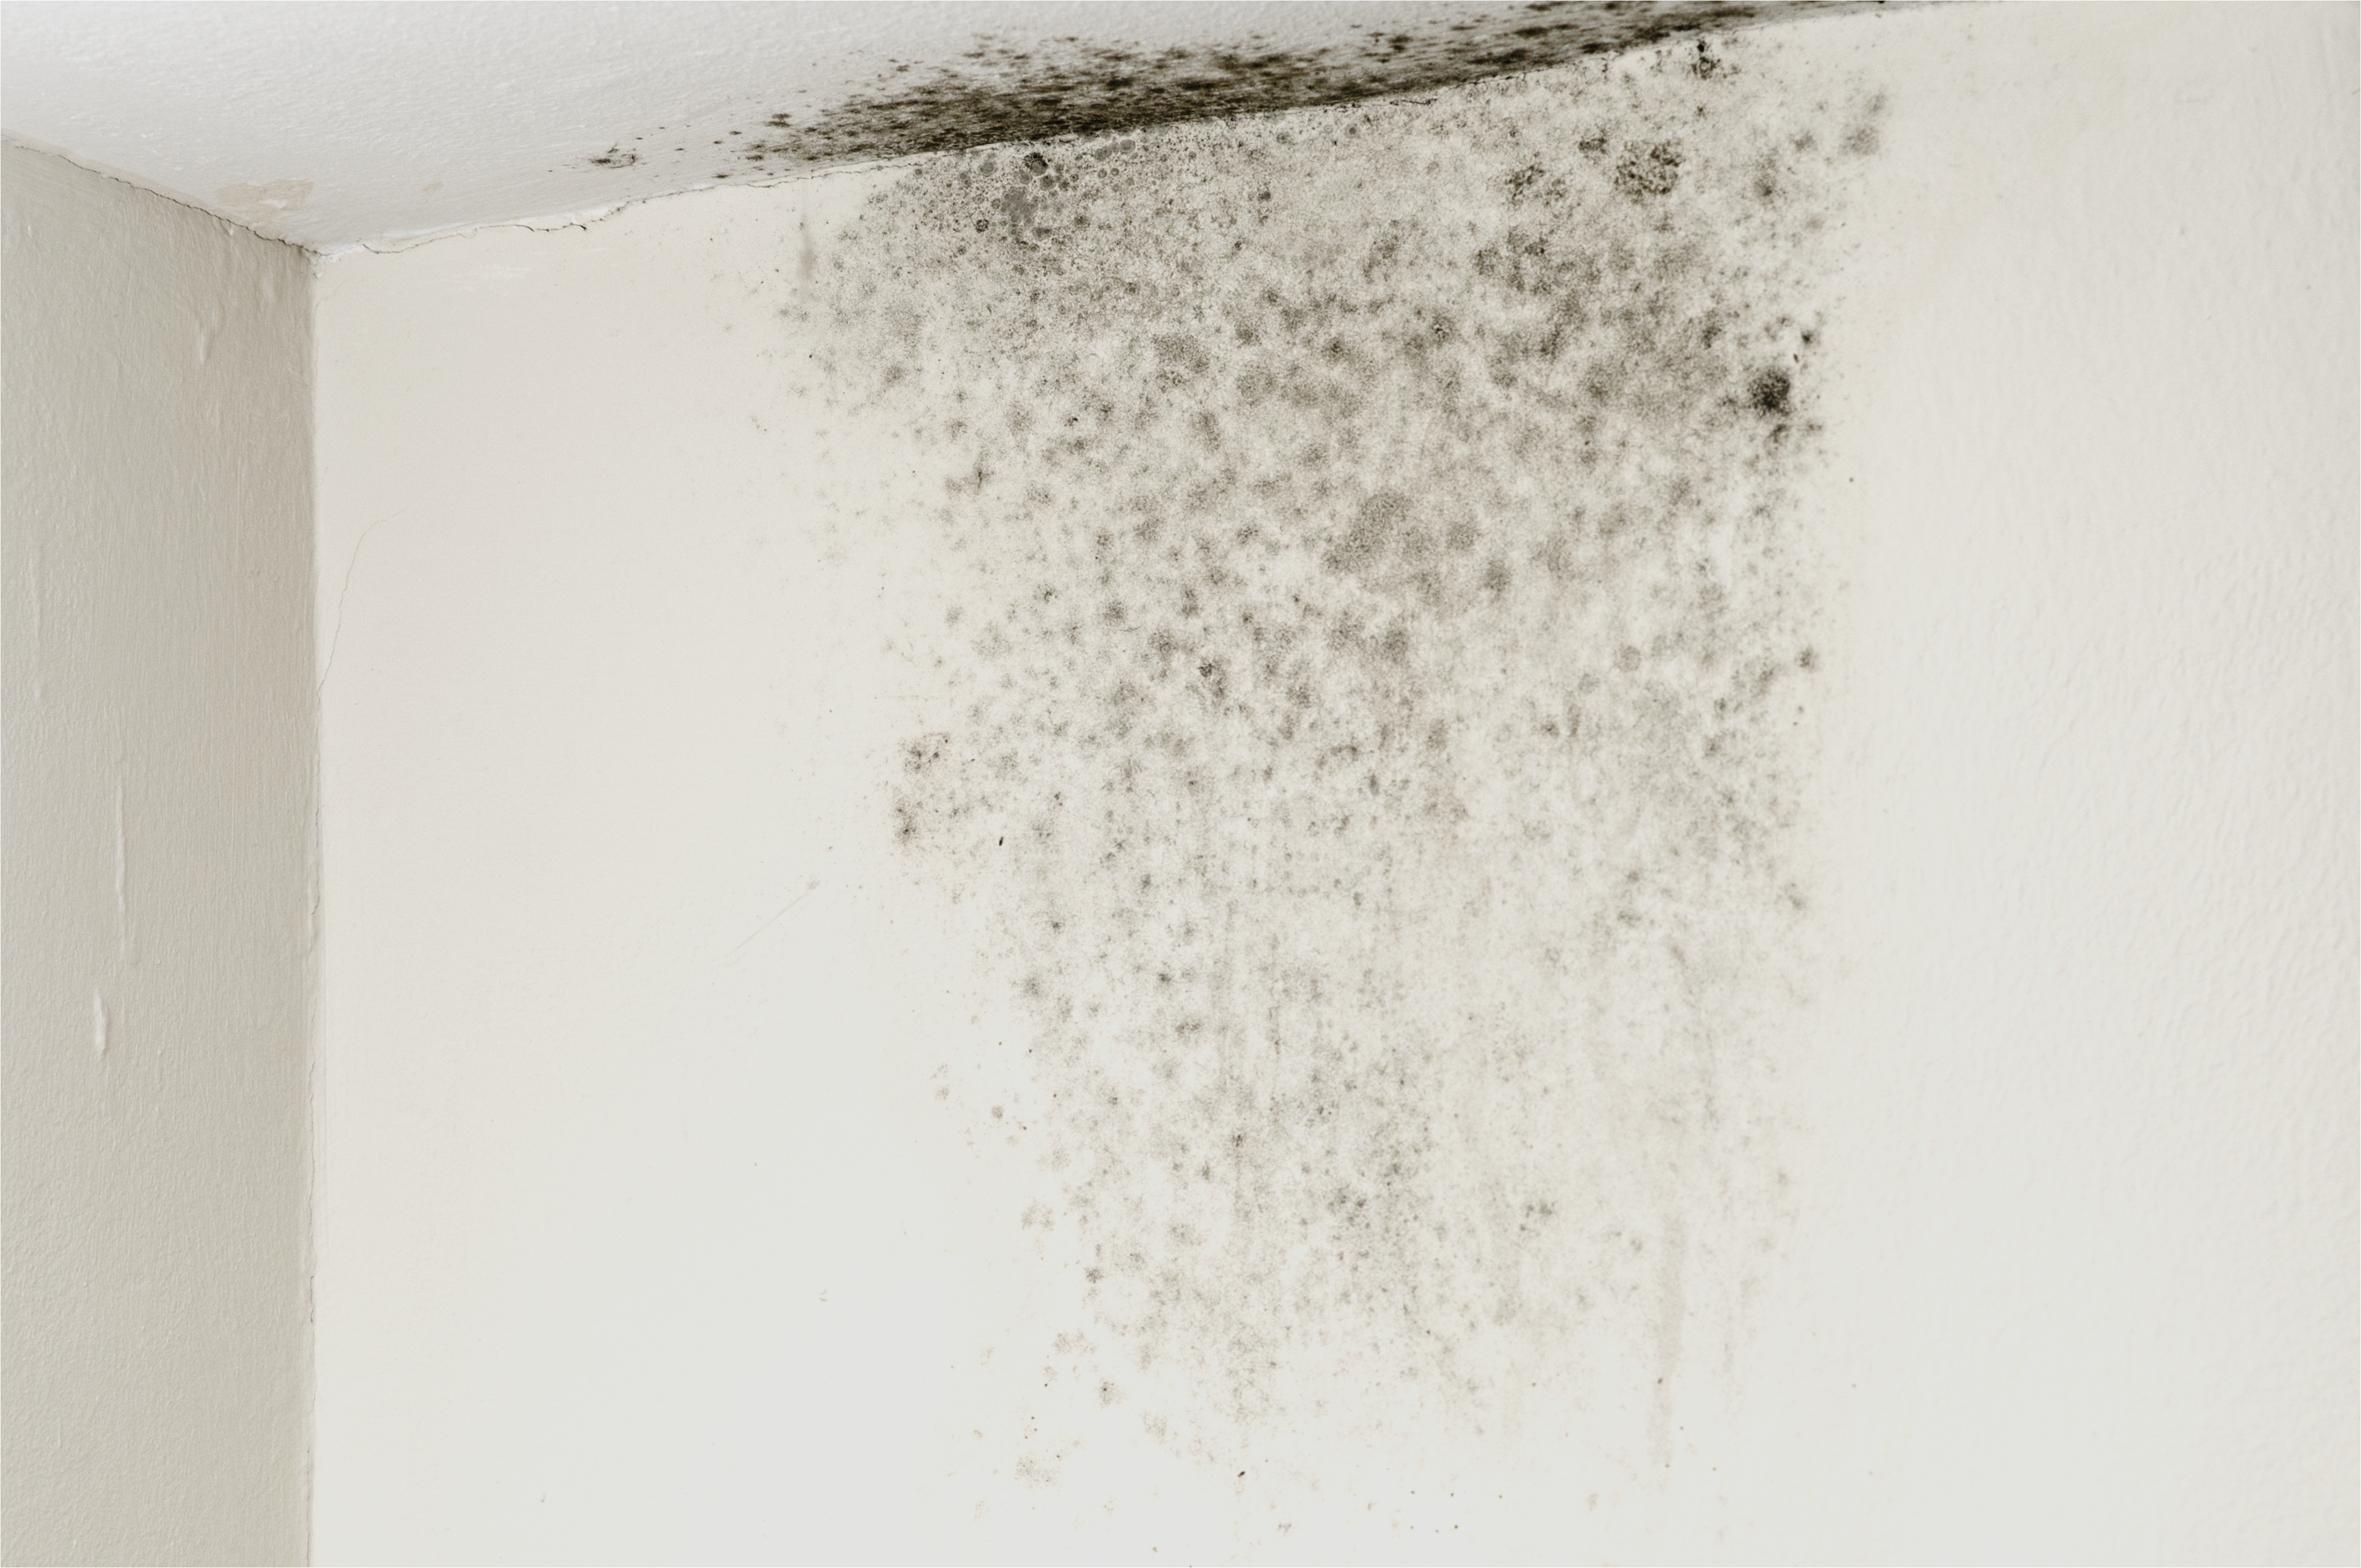 Moisissure plafond salle de bain locataire impressionnant - Nettoyer moisissure salle de bain ...